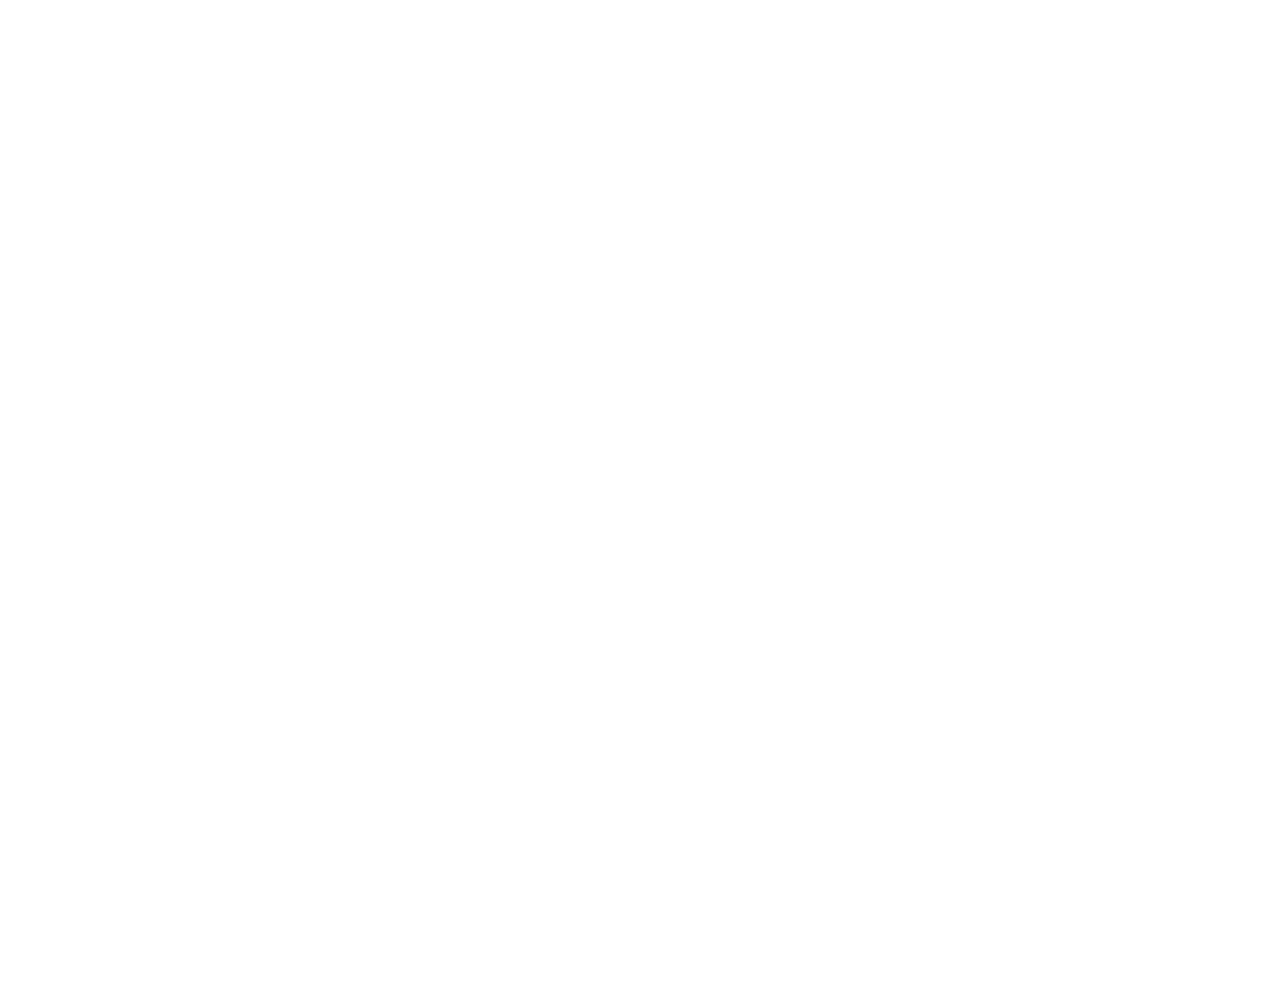 52Group_white